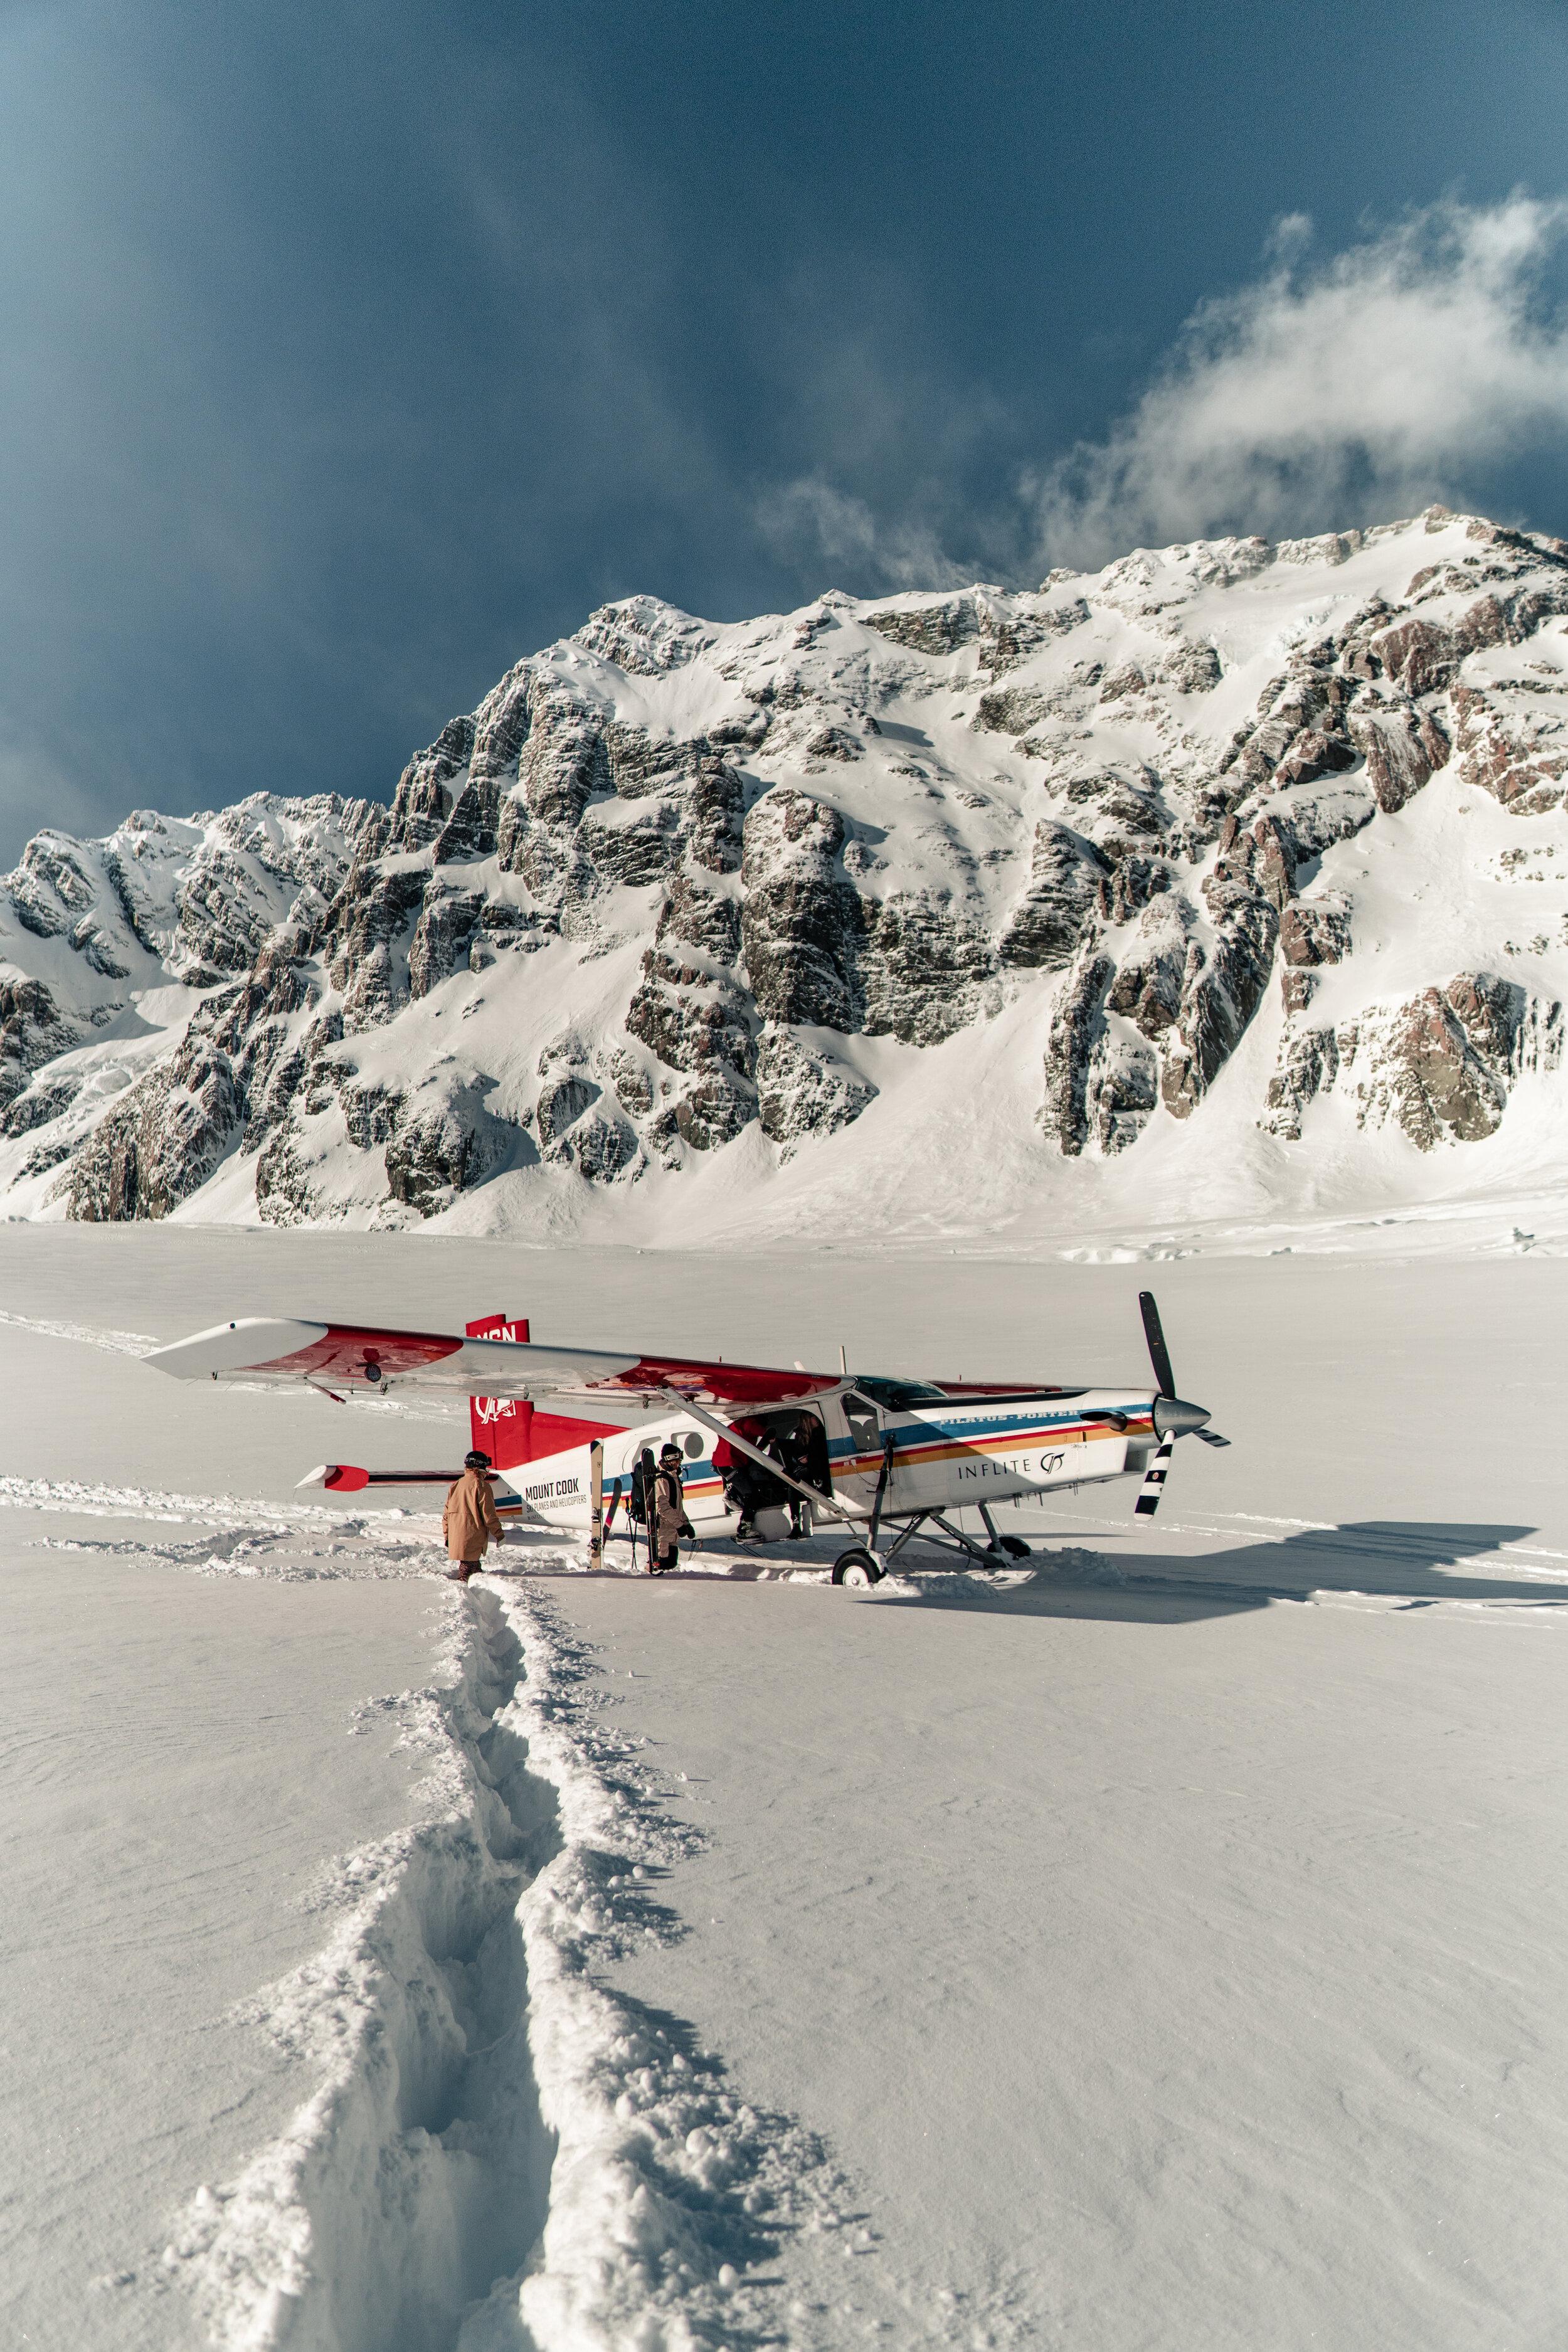 Mabey Ski_New Zealand_Mt Cook Ski Planes and Helicopters_Ski Plane on the Tasman Glacier_2.jpg